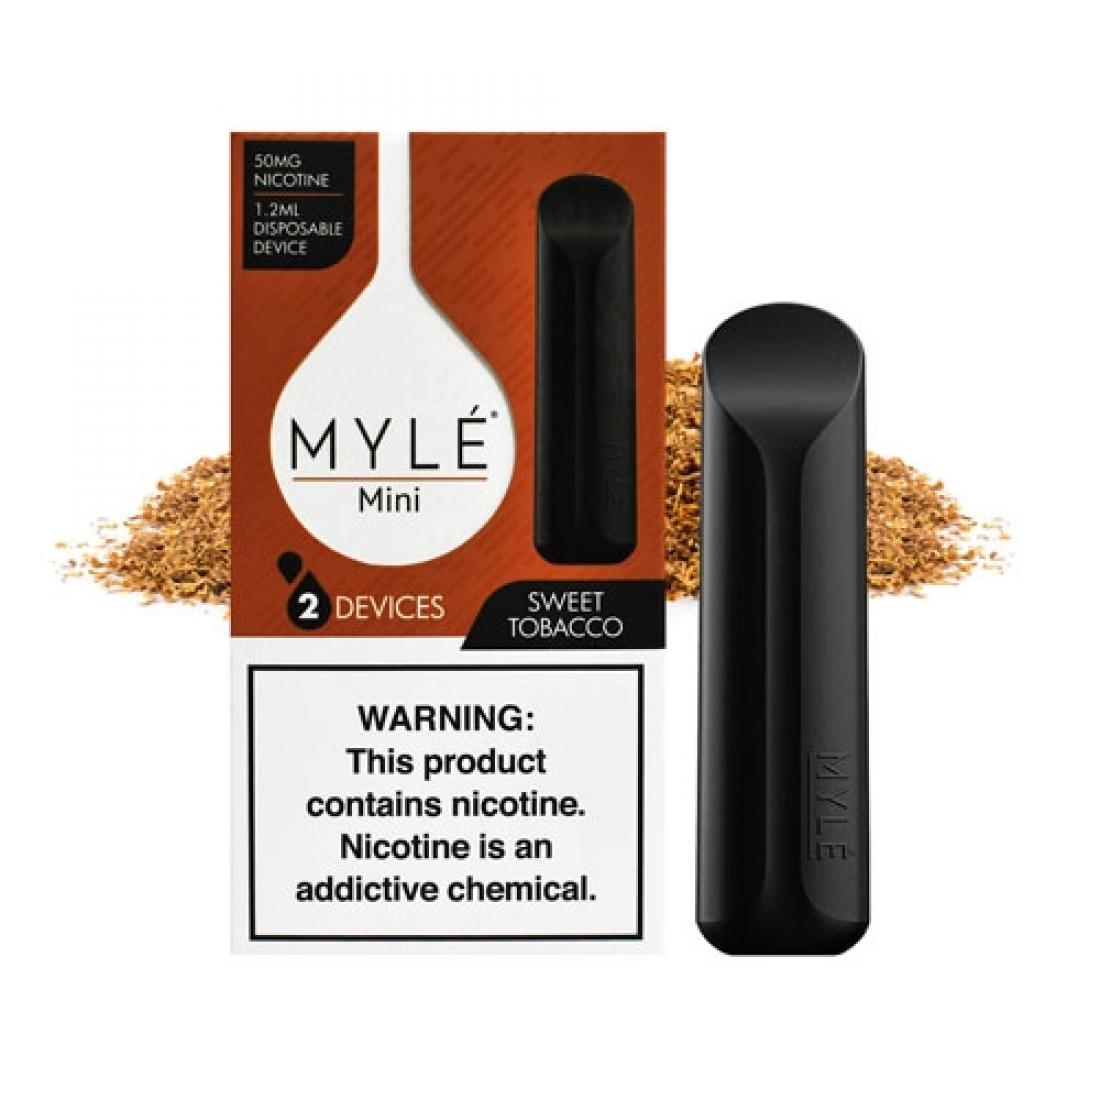 Myle Vape Disposable We Review It - crossdomainxml